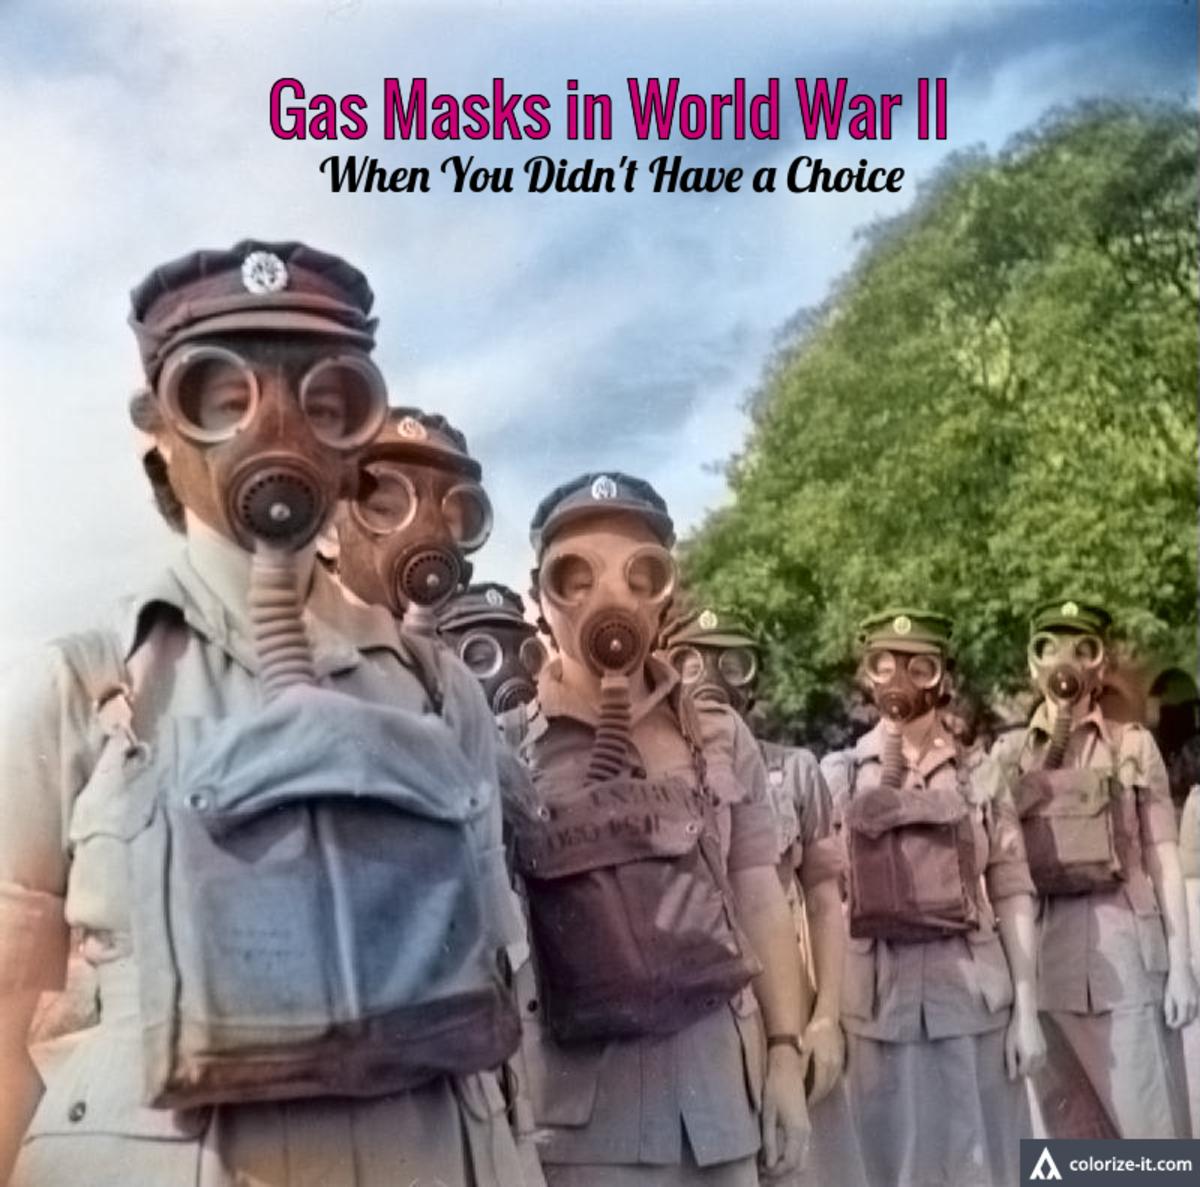 Gas Masks in World War II - When You Didn't Have a Choice